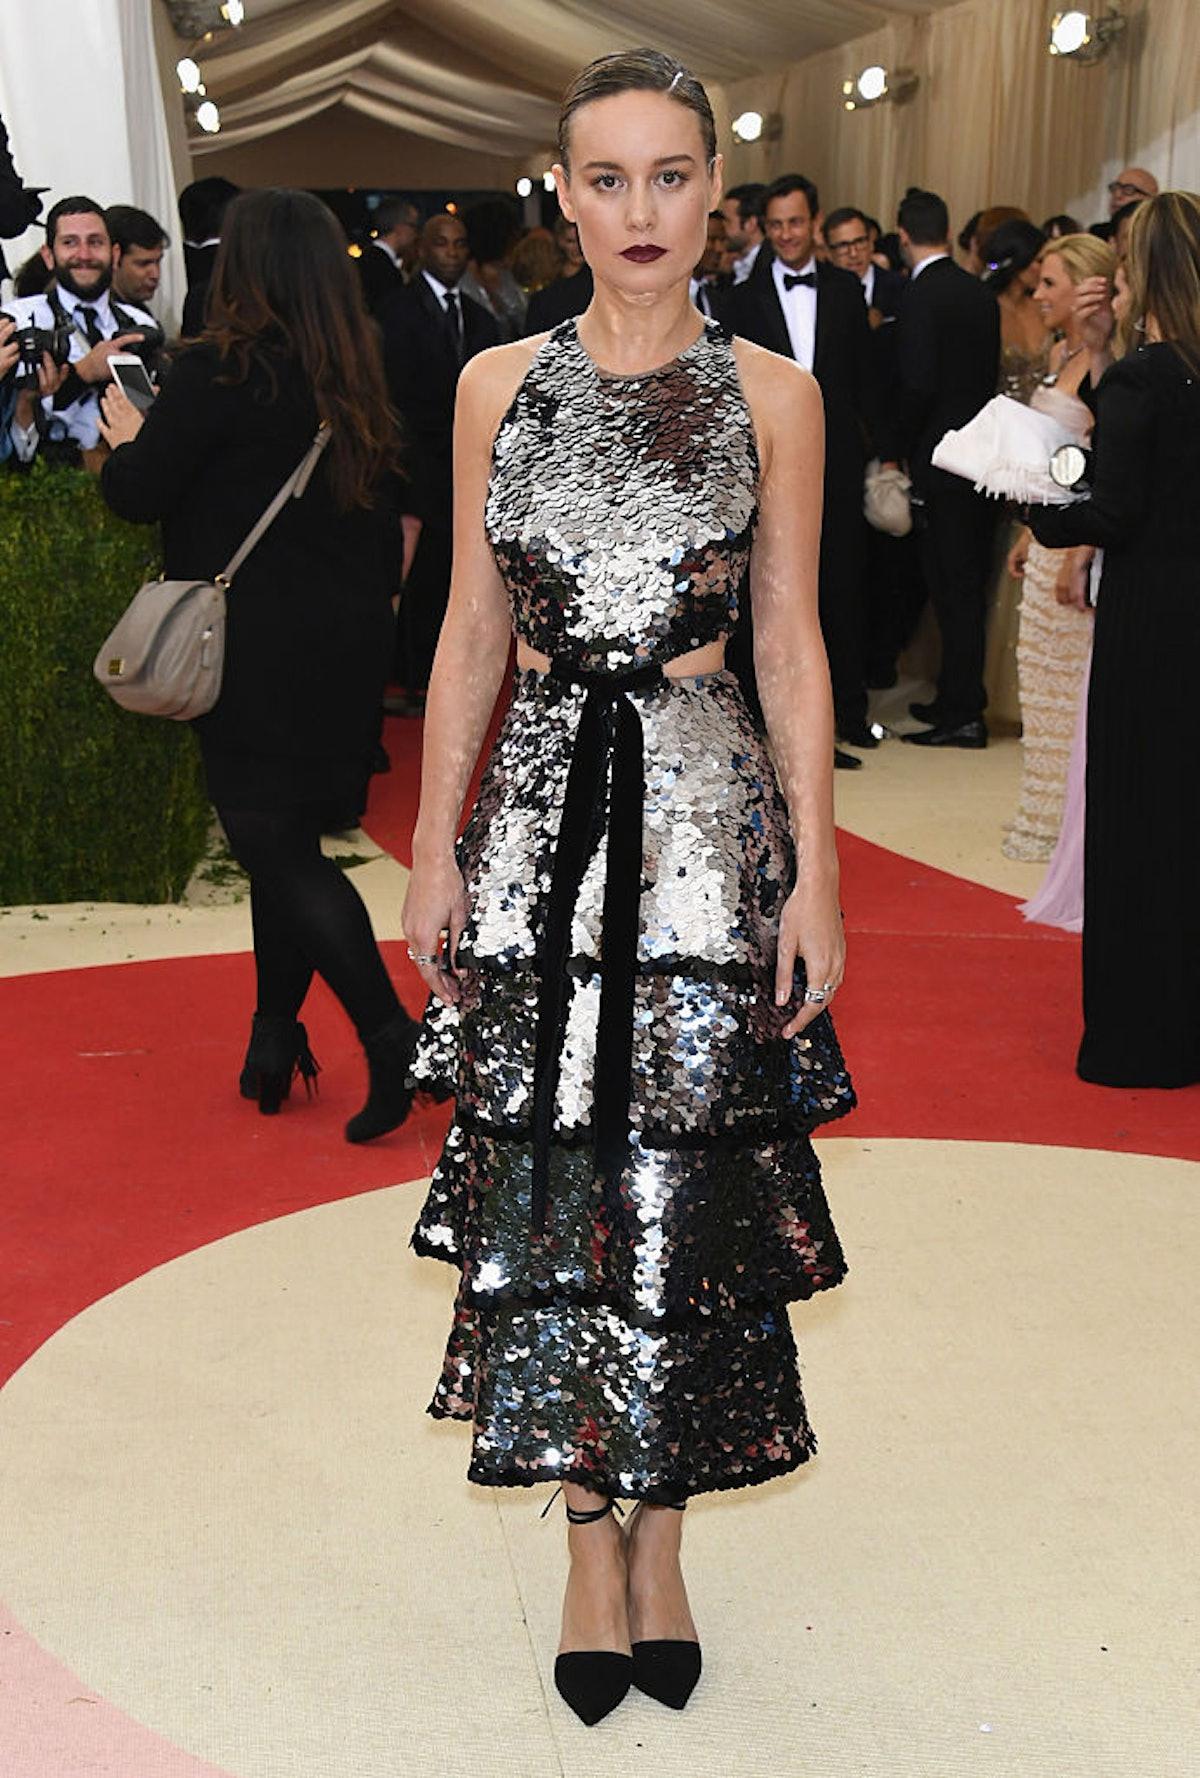 Brie Larson at the Met Gala